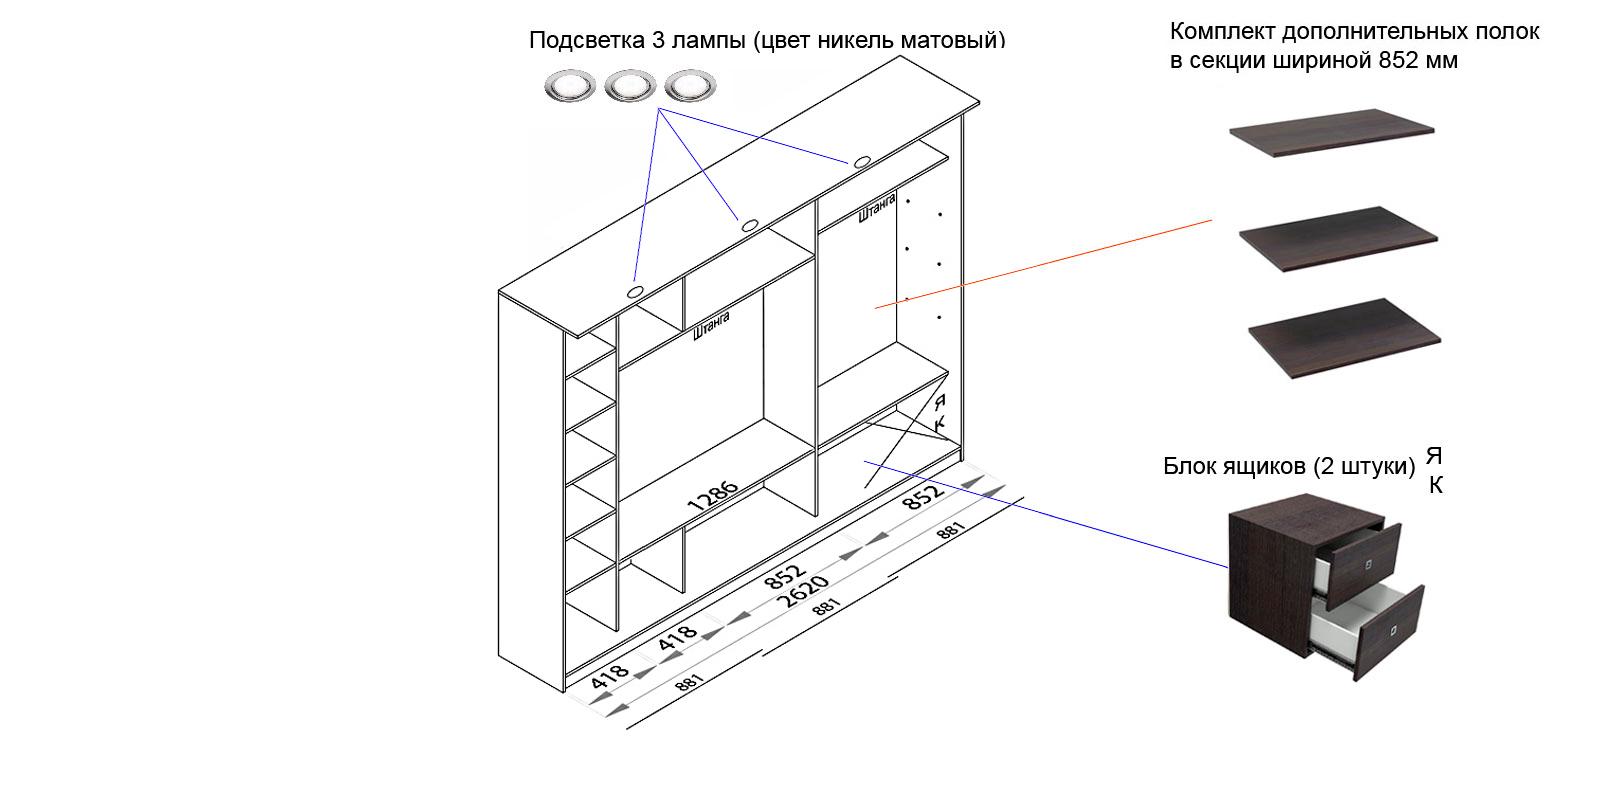 Шкаф-купе трехдверный Манчестер 260 см (дуб феррара/дуб сонома+зеркало) от HomeMe.ru